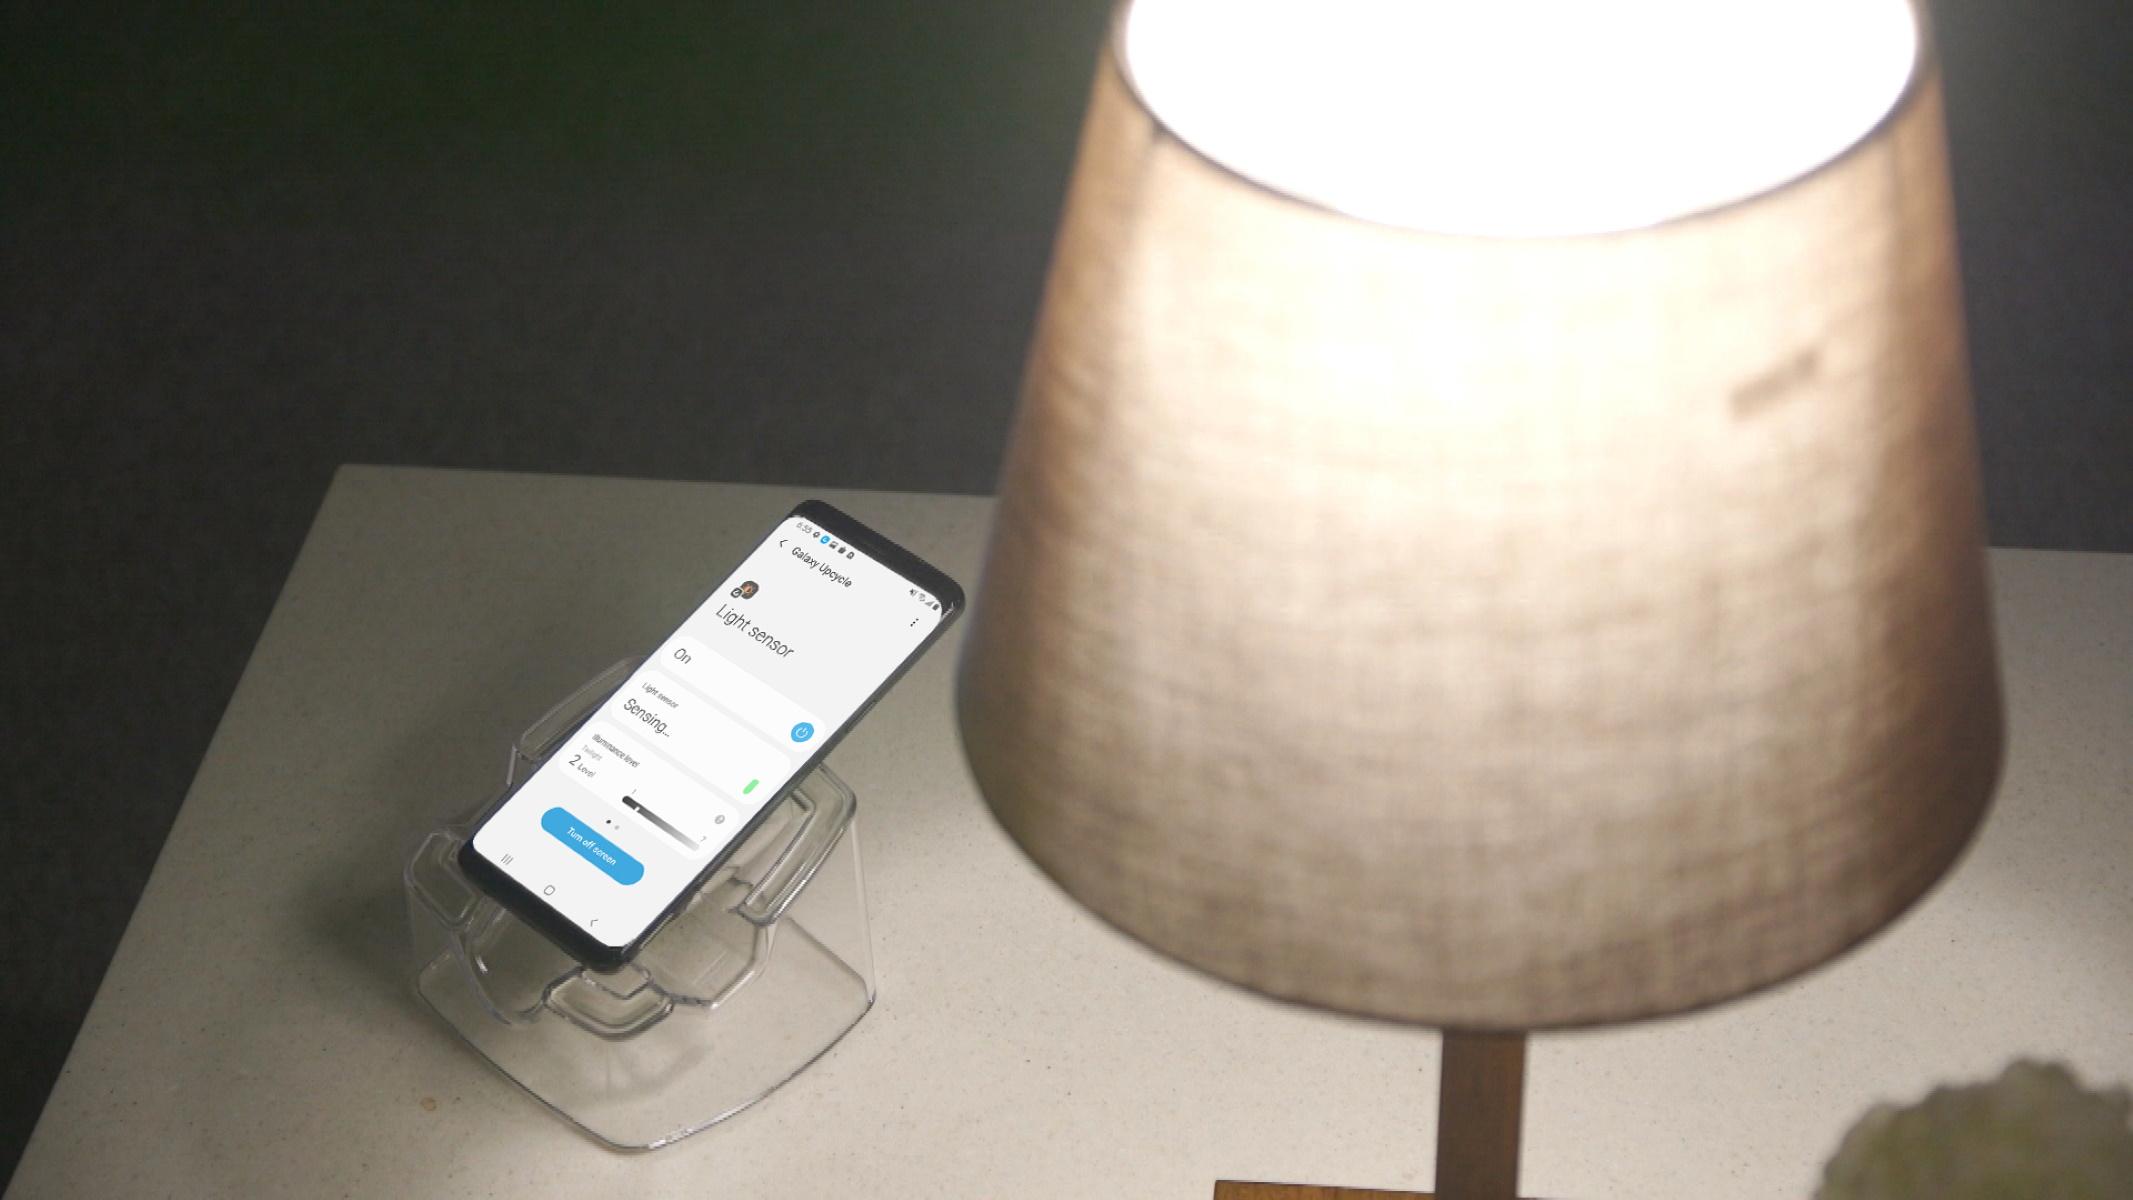 Smart phones μετατρέπονται σε έξυπνες οικιακές συσκευές